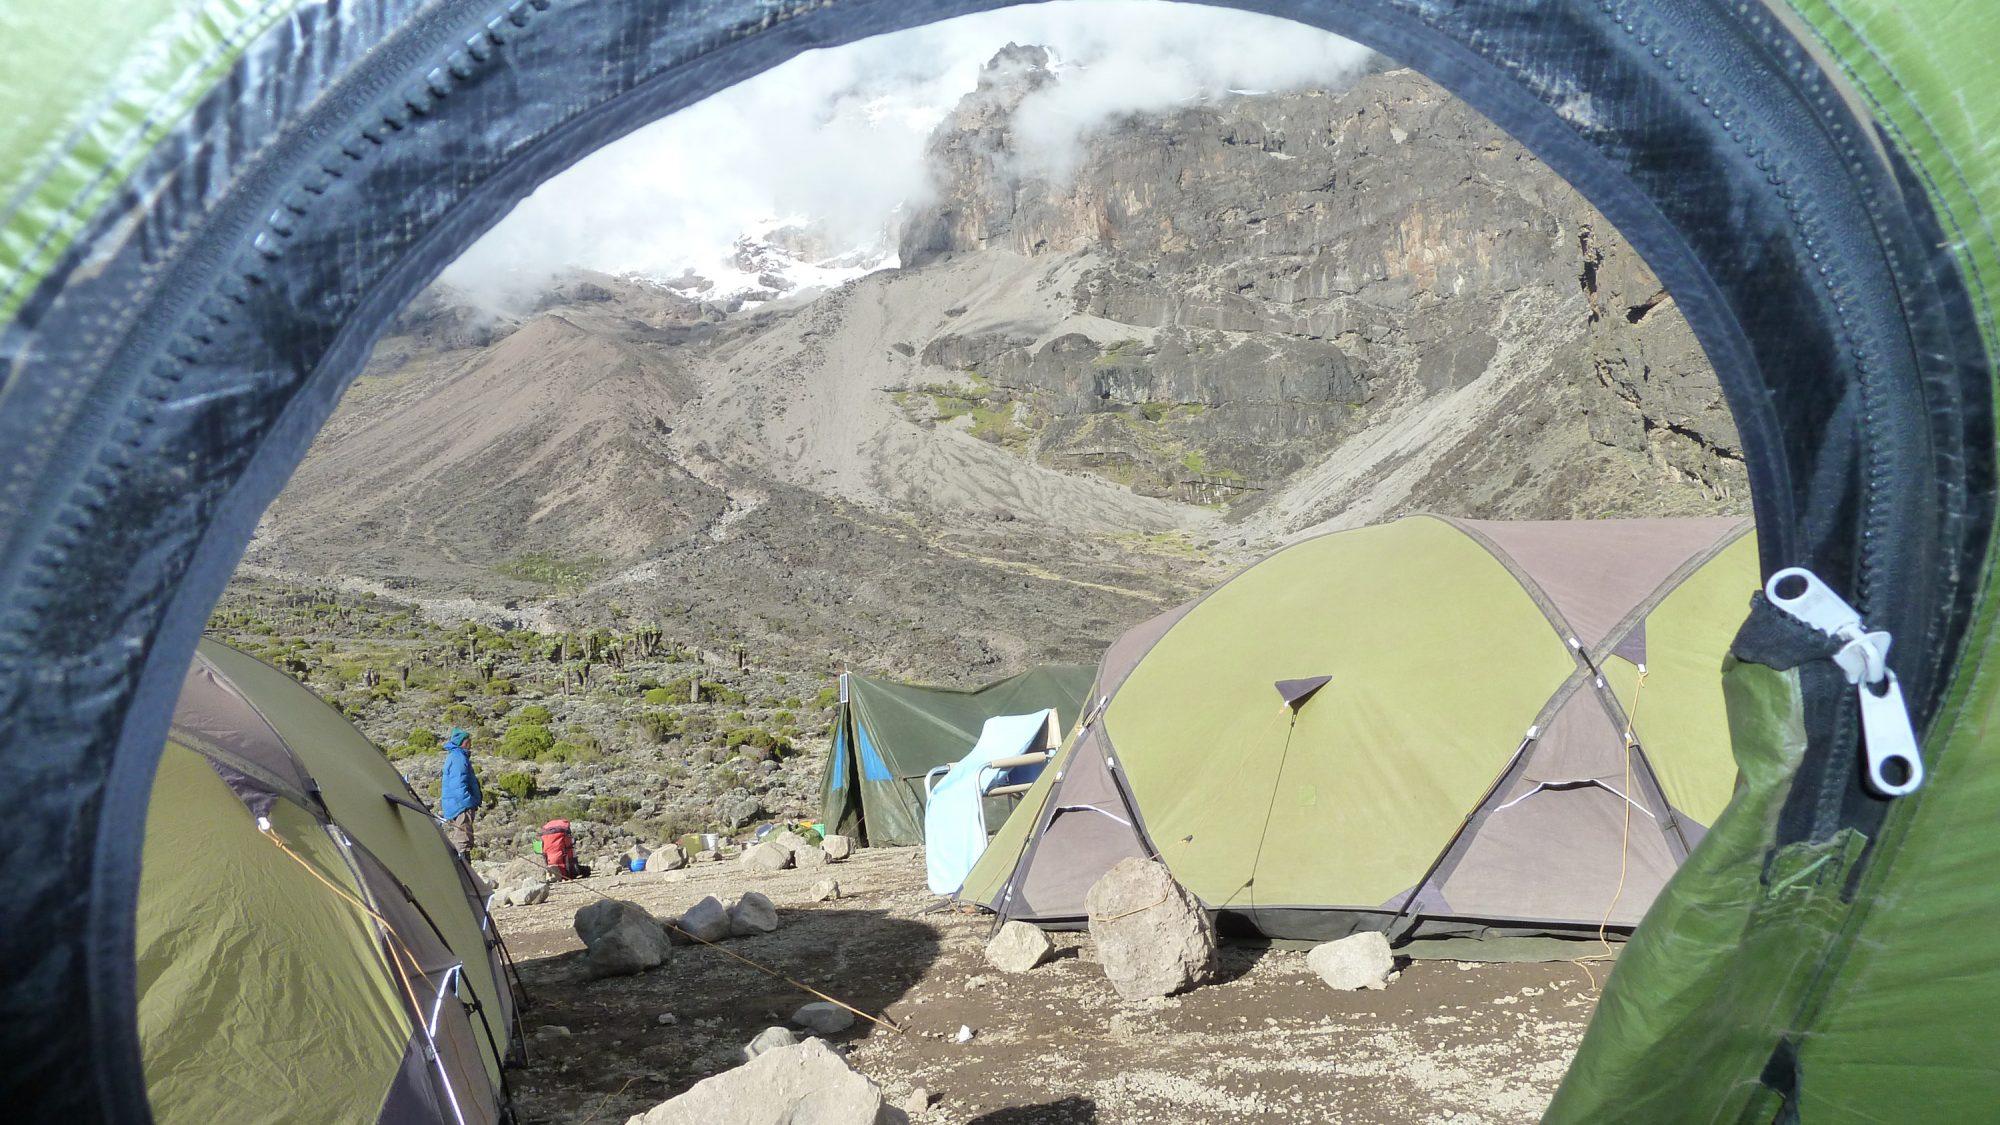 Blick vom Zelt im Barranco Camp, Kilimandscharo, Kilimandscharo besteigen, Tansania, Afrika, Kilimandscharo Tour, Erfahrungsbericht, Machame Route